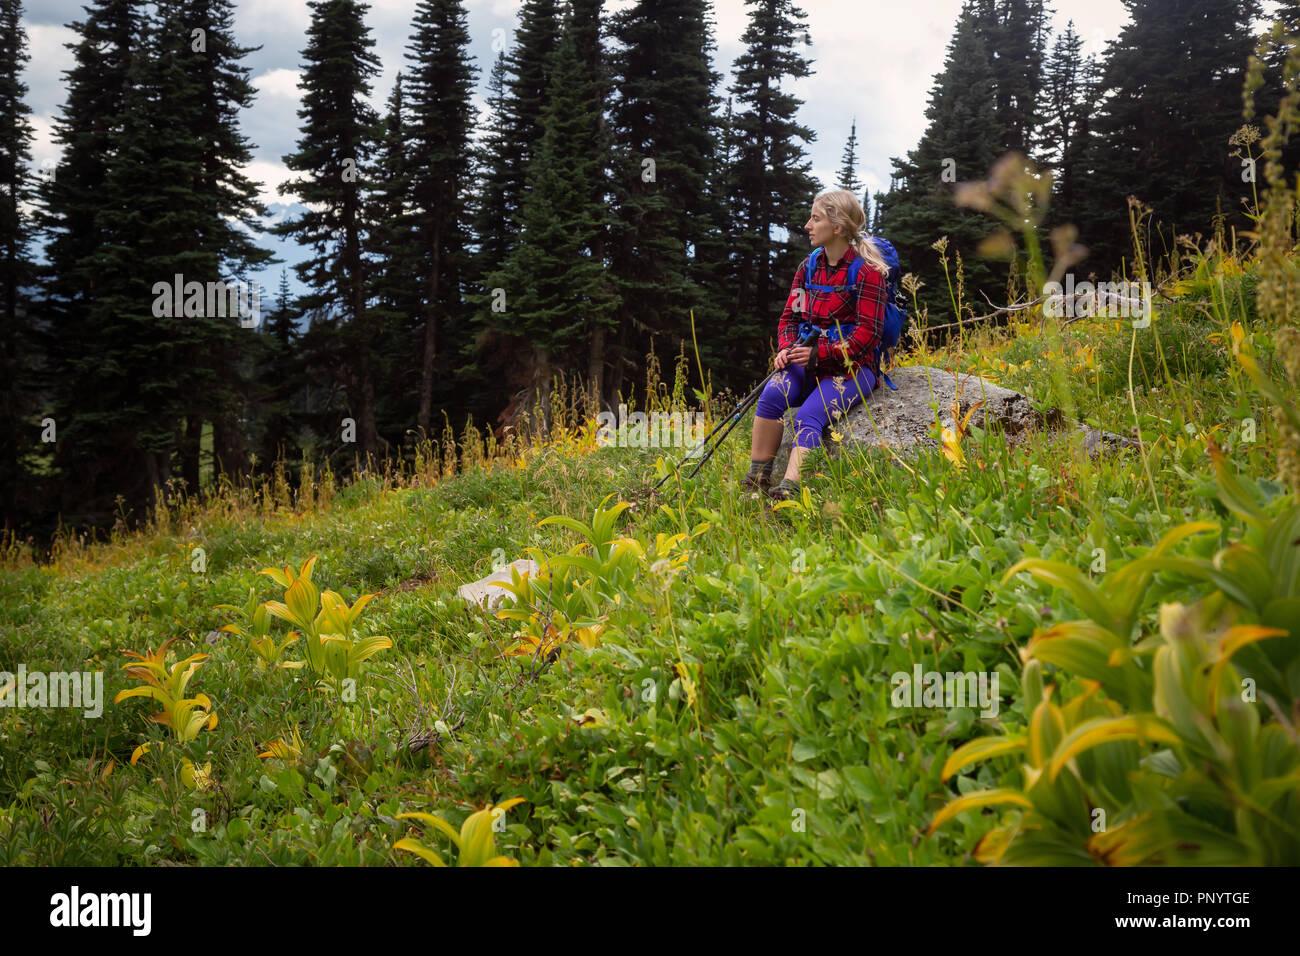 1d7cf972ff8d Girl enjoying the beautiful nature during a vibrant cloudy summer day.  Taken in Garibaldi Provincial Park